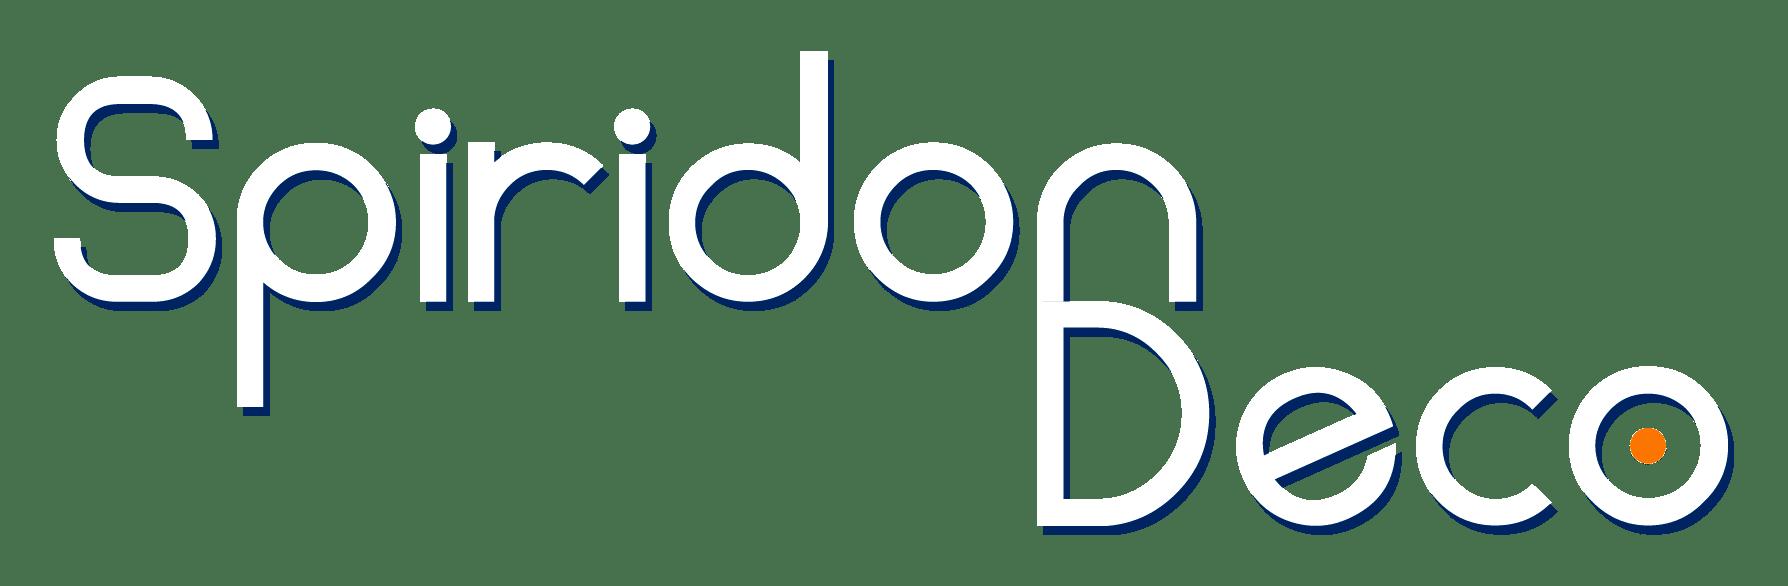 Spiridon Deco